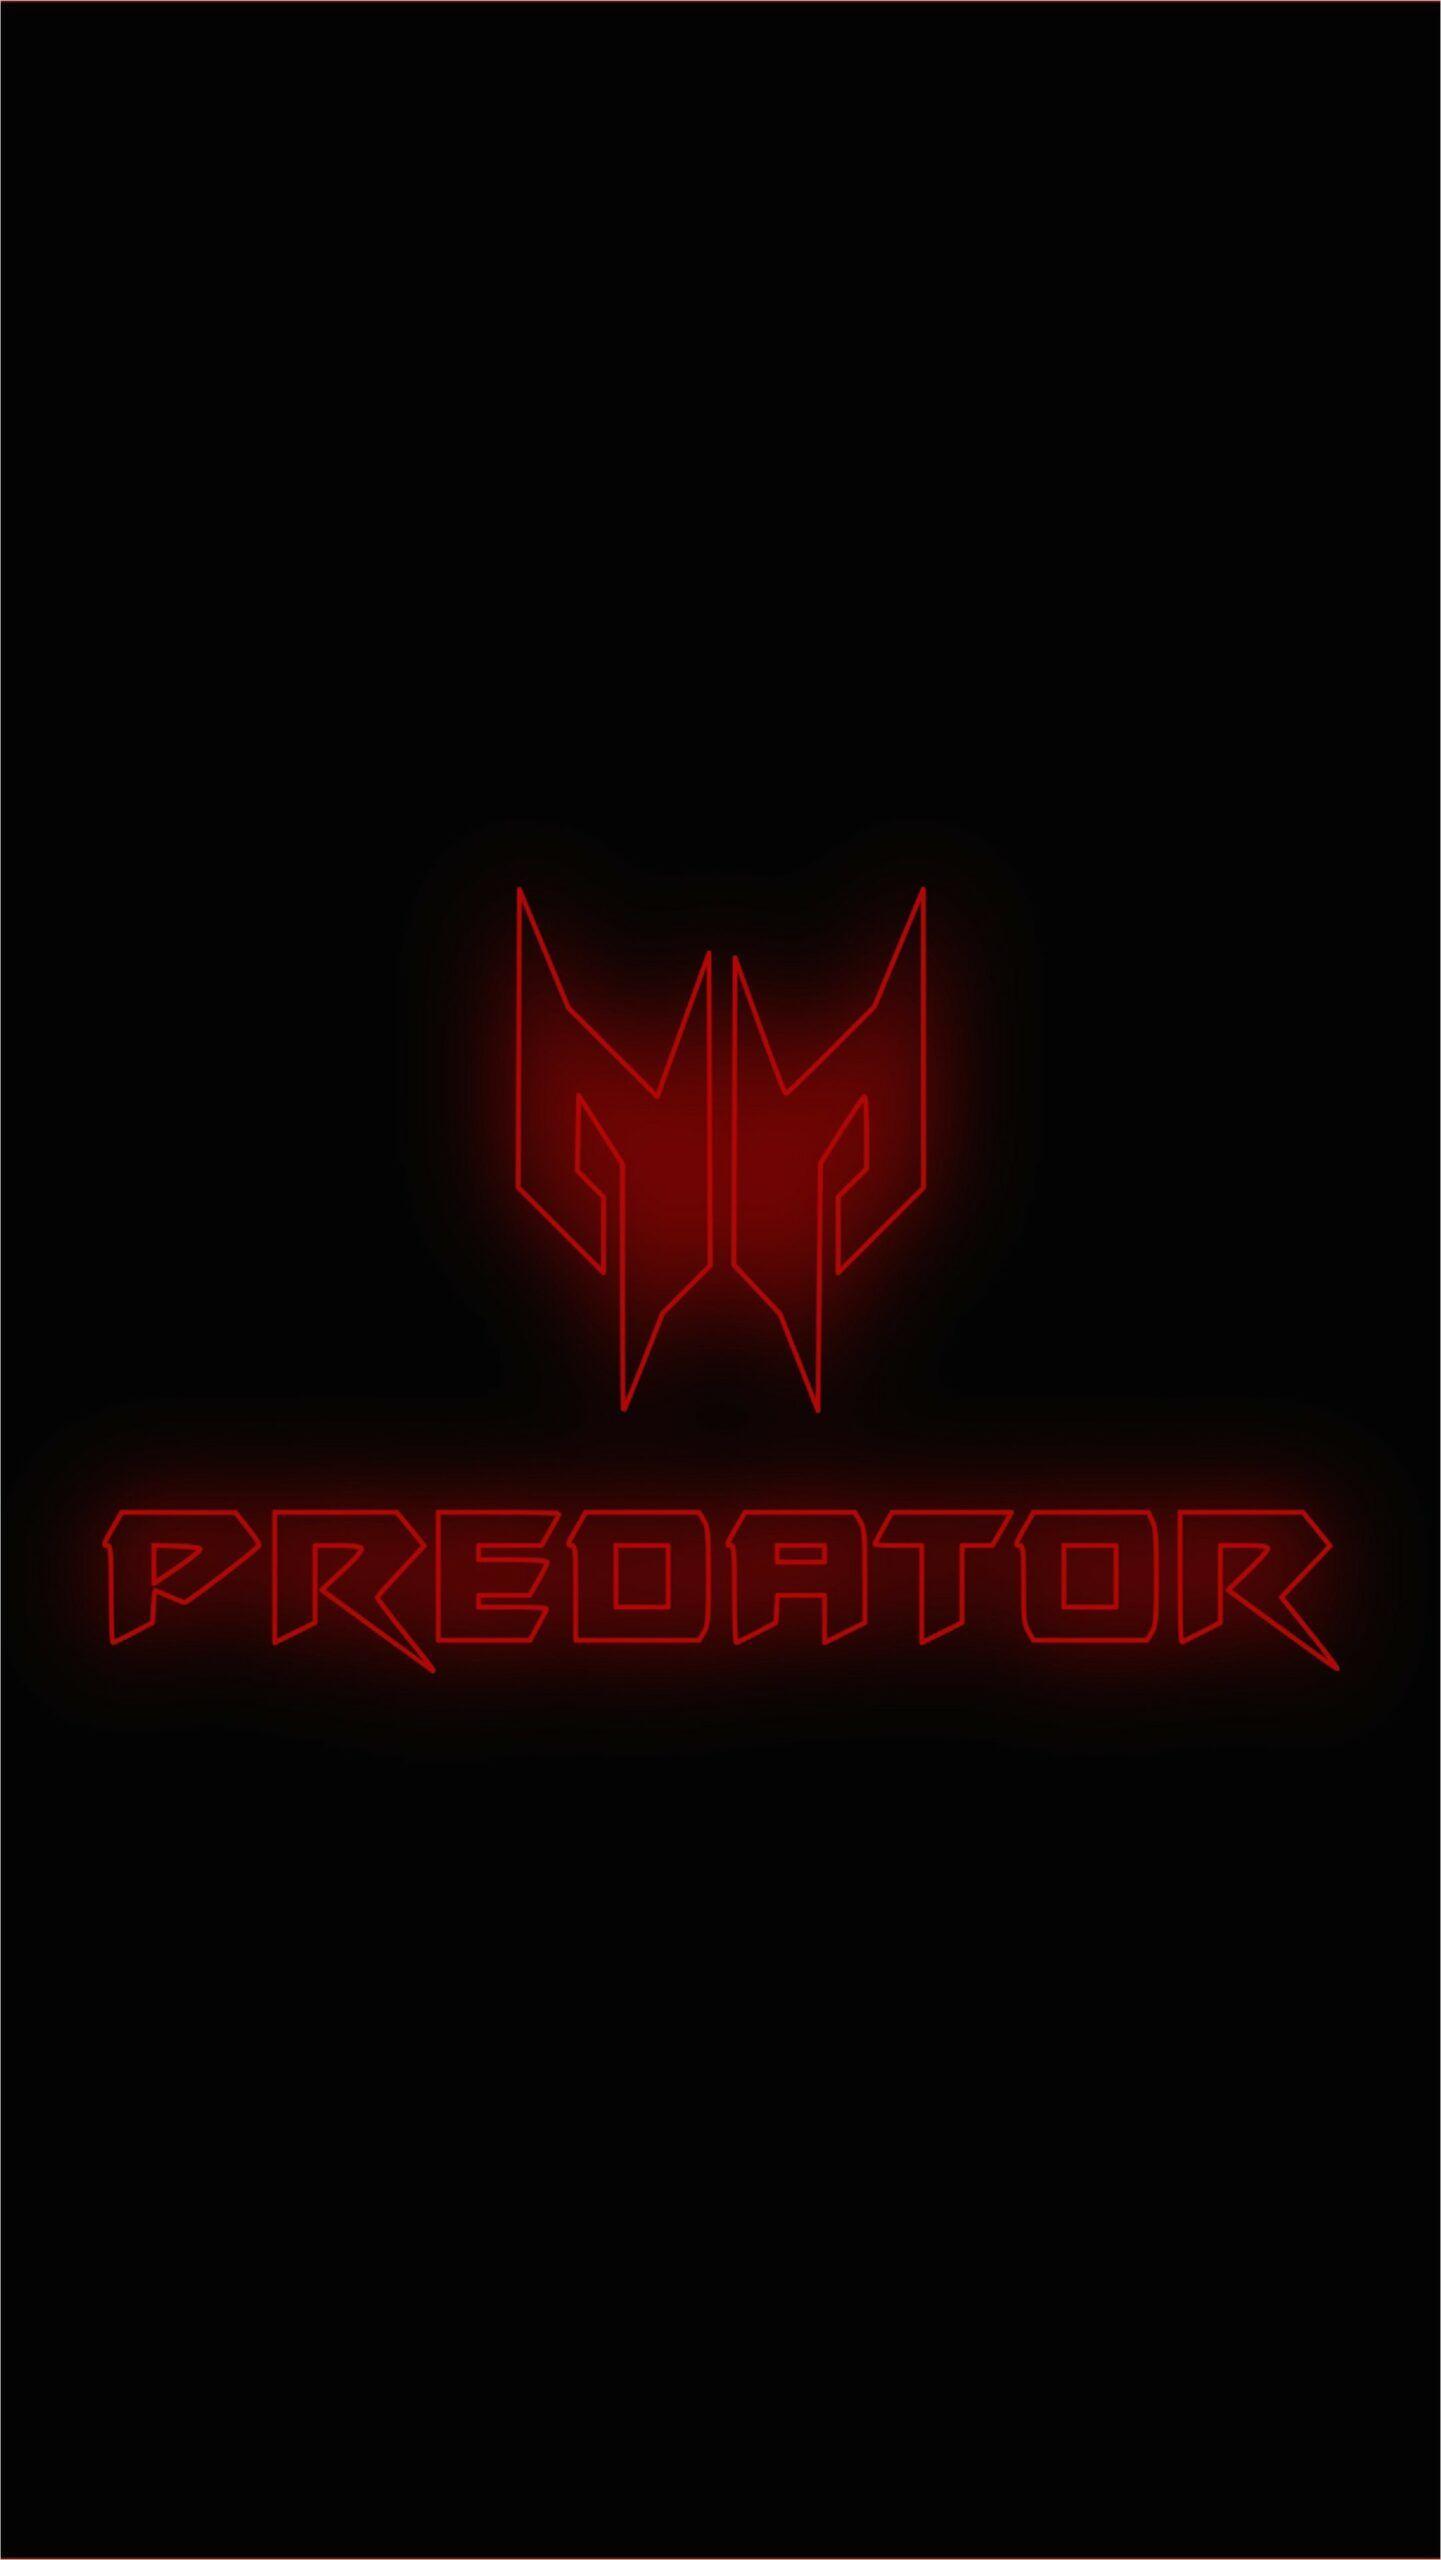 Acer Predator Logo Wallpaper 4k In 2020 Predator Logos Wallpaper